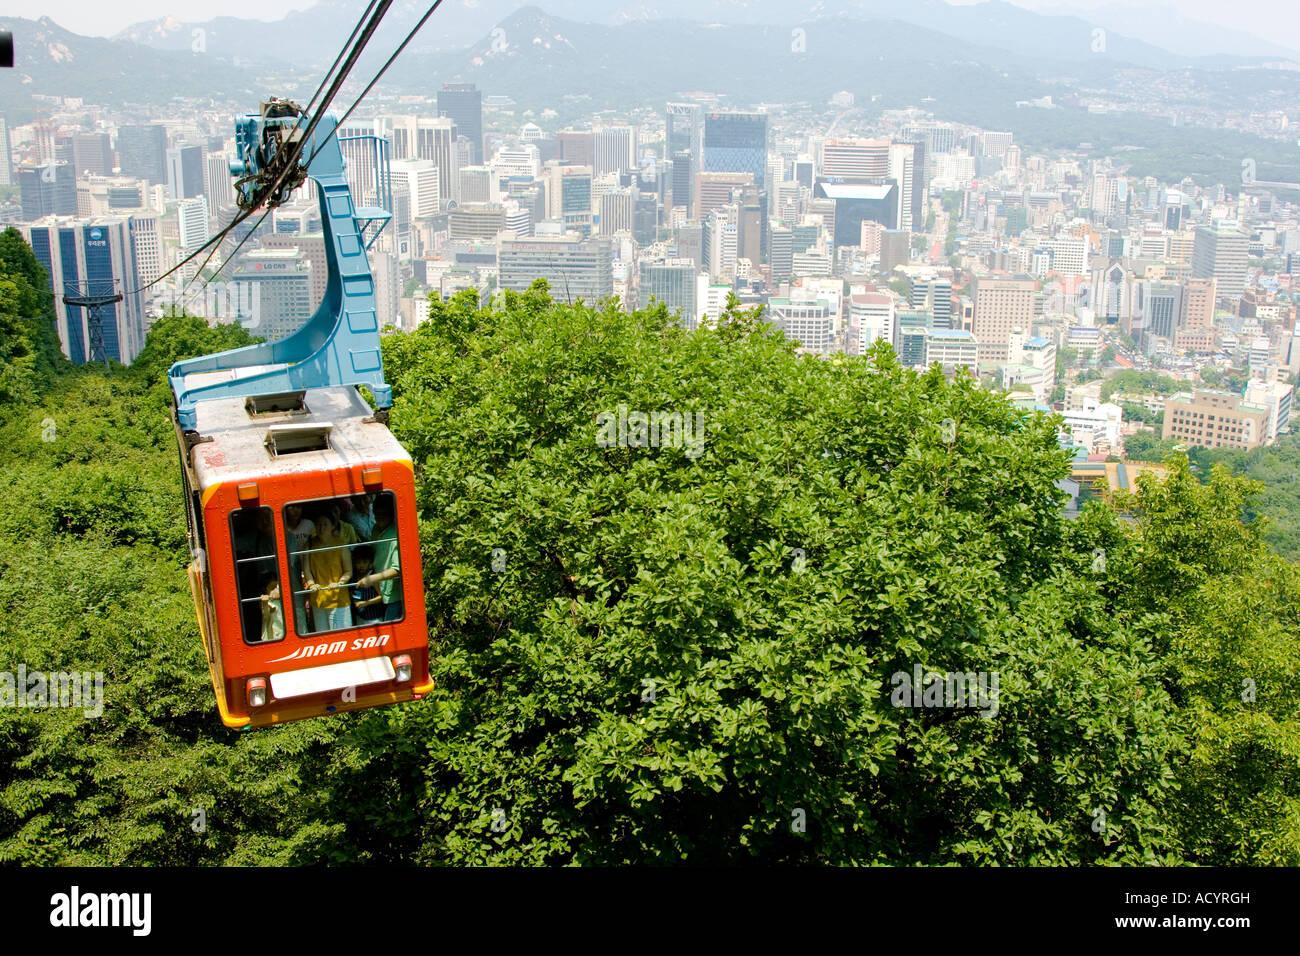 Namsan cable car - Cable Car To N Seoul Tower Seoul South Korea Stock Image